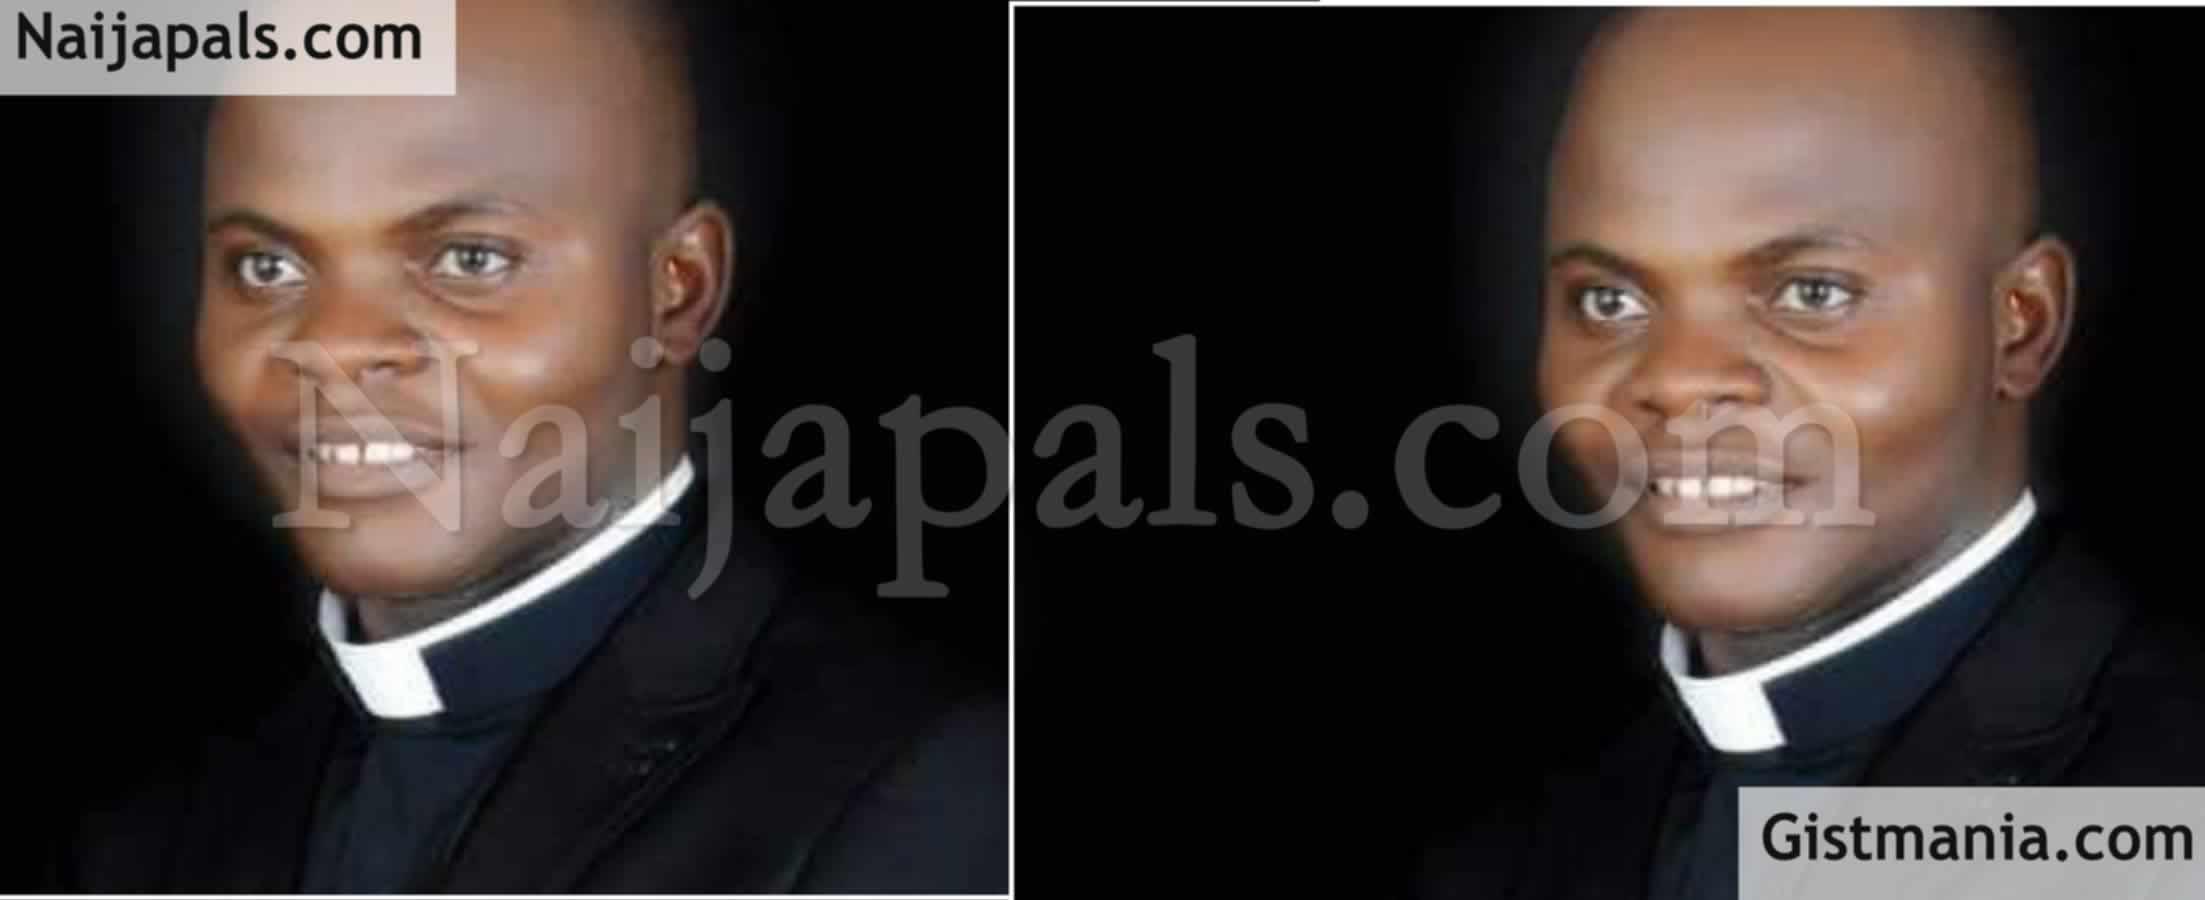 <img alt='.' class='lazyload' data-src='https://img.gistmania.com/emot/news.gif' /><img alt='.' class='lazyload' data-src='https://img.gistmania.com/emot/cry.gif' /> <b>Bandits Kidnap, Kill Catholic Priest, Rev. Father John Gbakaan Yaji In Niger State</b>